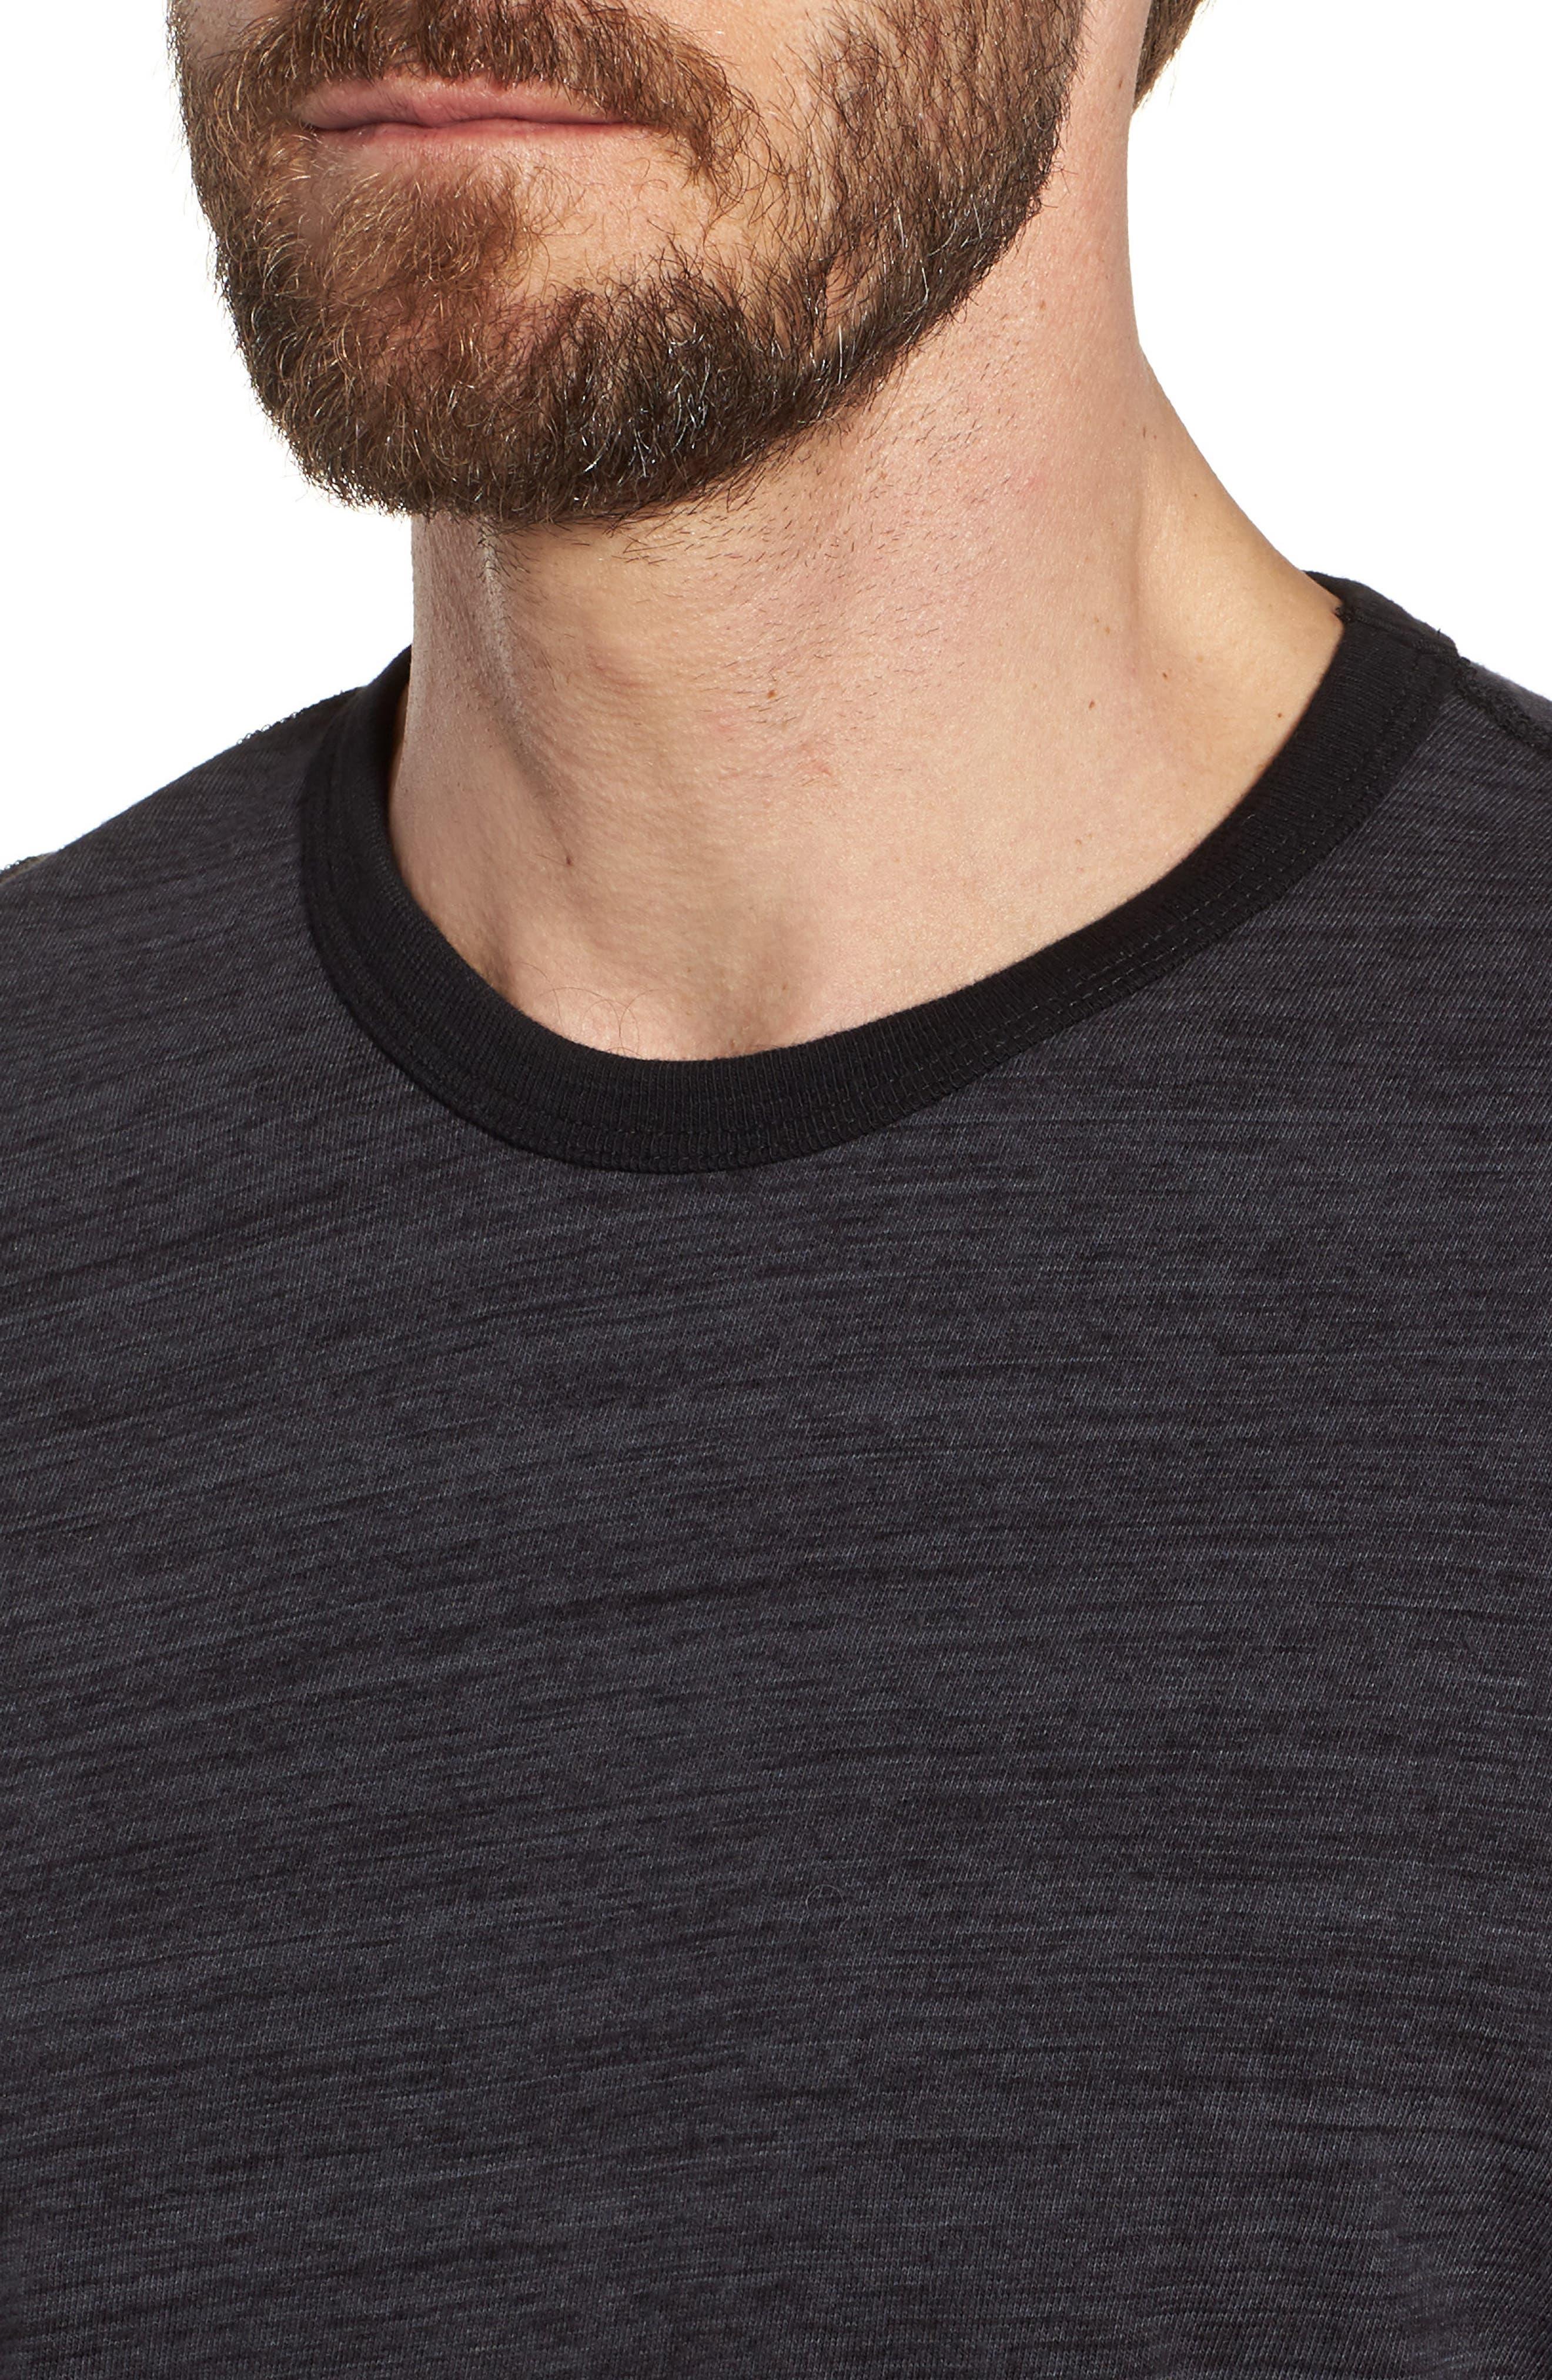 JAMES PERSE,                             Regular Fit Top Dyed Crewneck T-Shirt,                             Alternate thumbnail 4, color,                             002